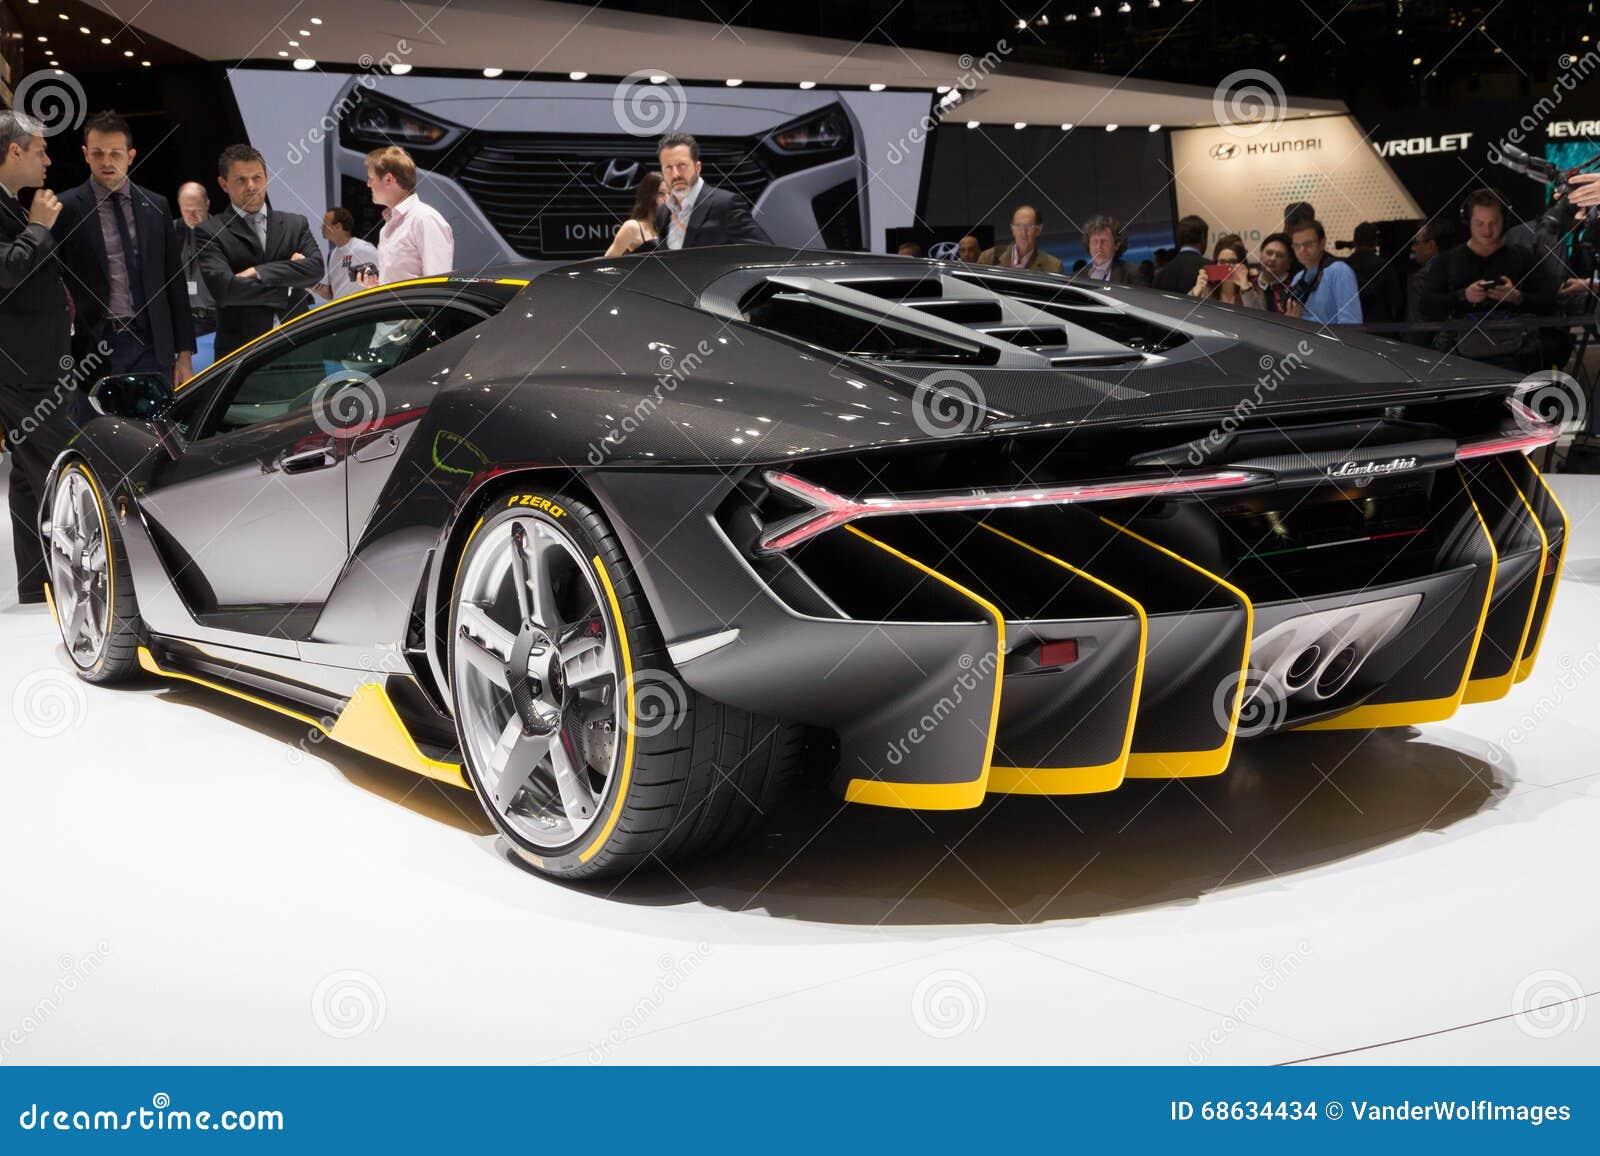 Lamborghini Lp770 4 Centenario Sports Car Editorial Stock